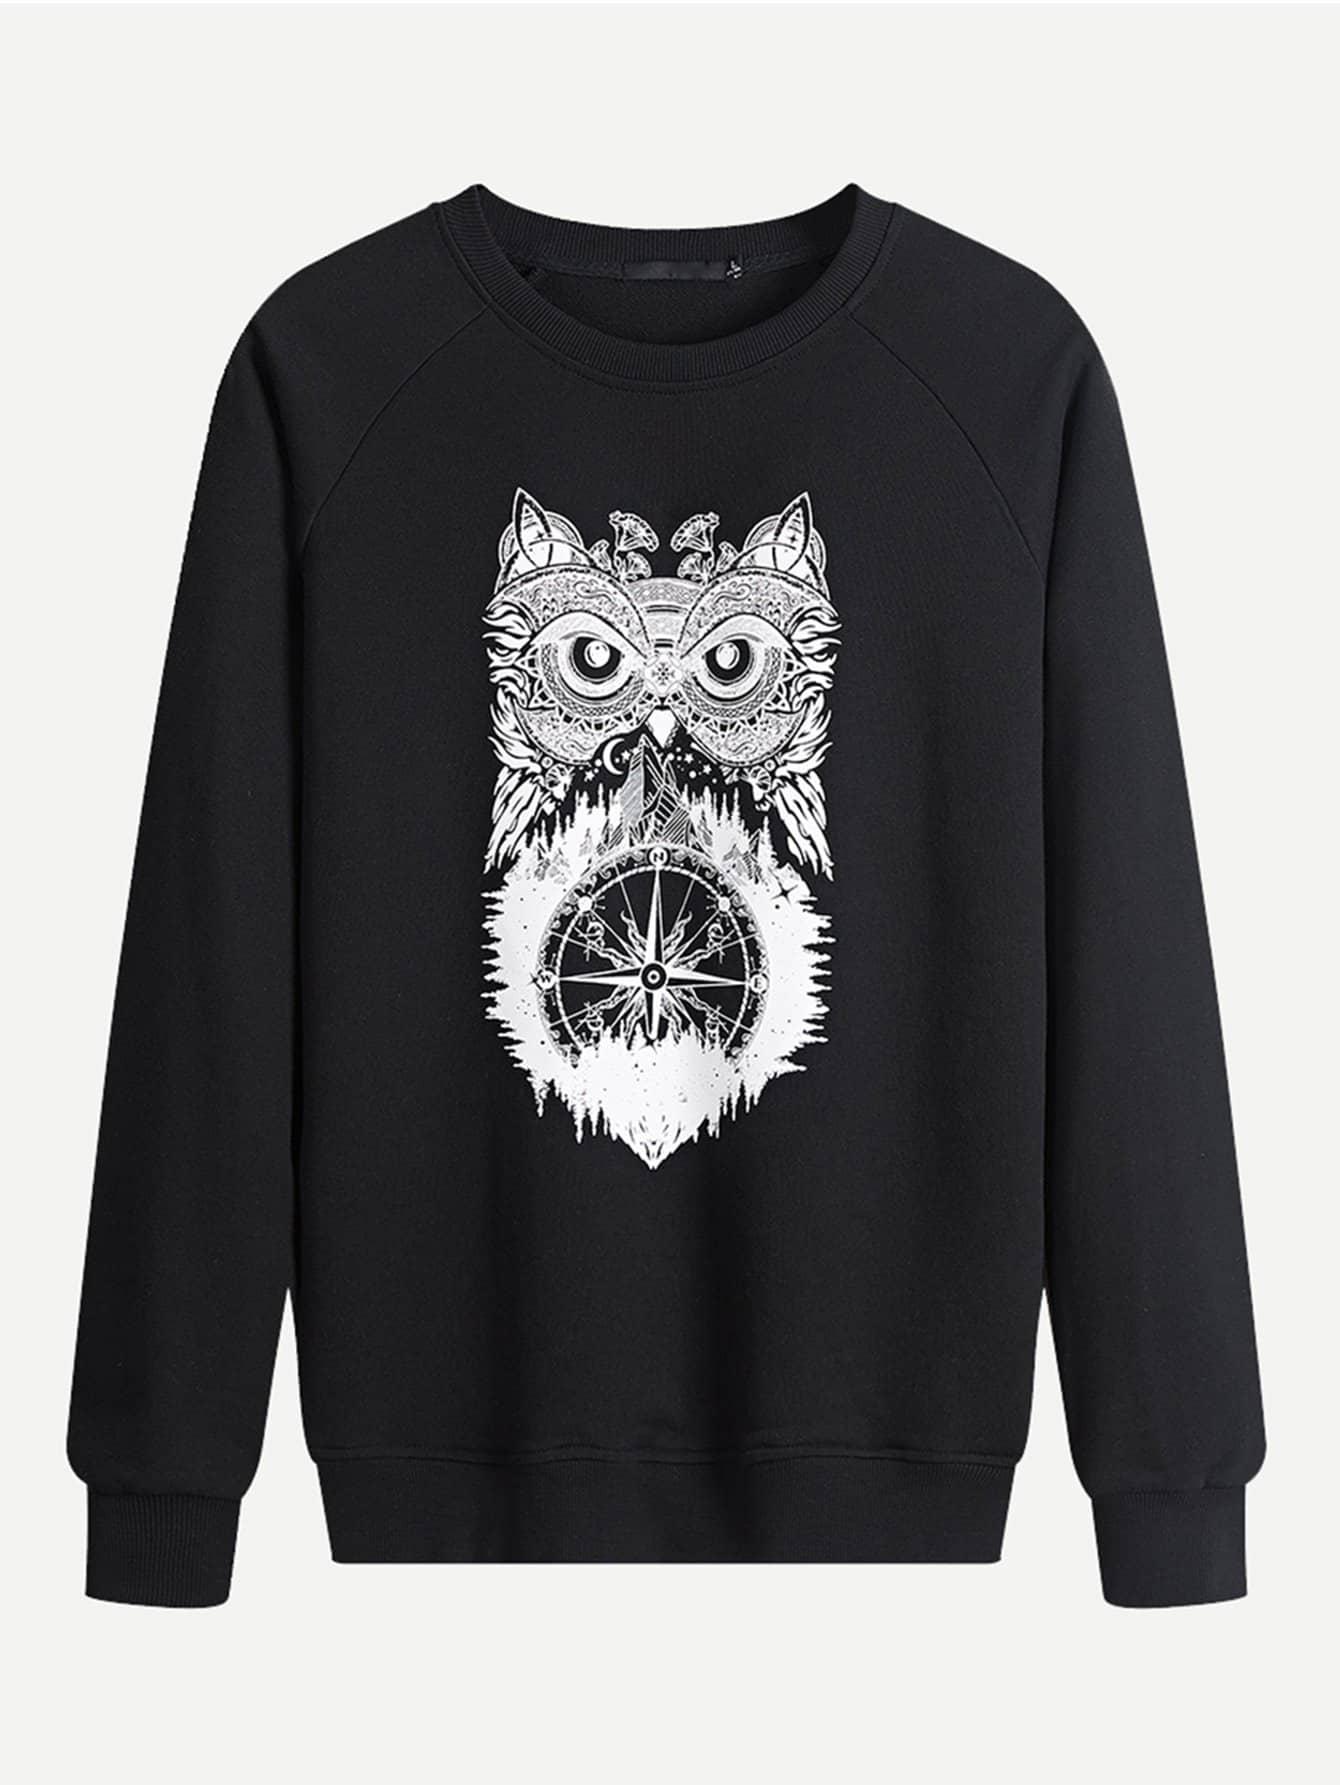 Men Owl Print Sweatshirt Men Owl Print Sweatshirt